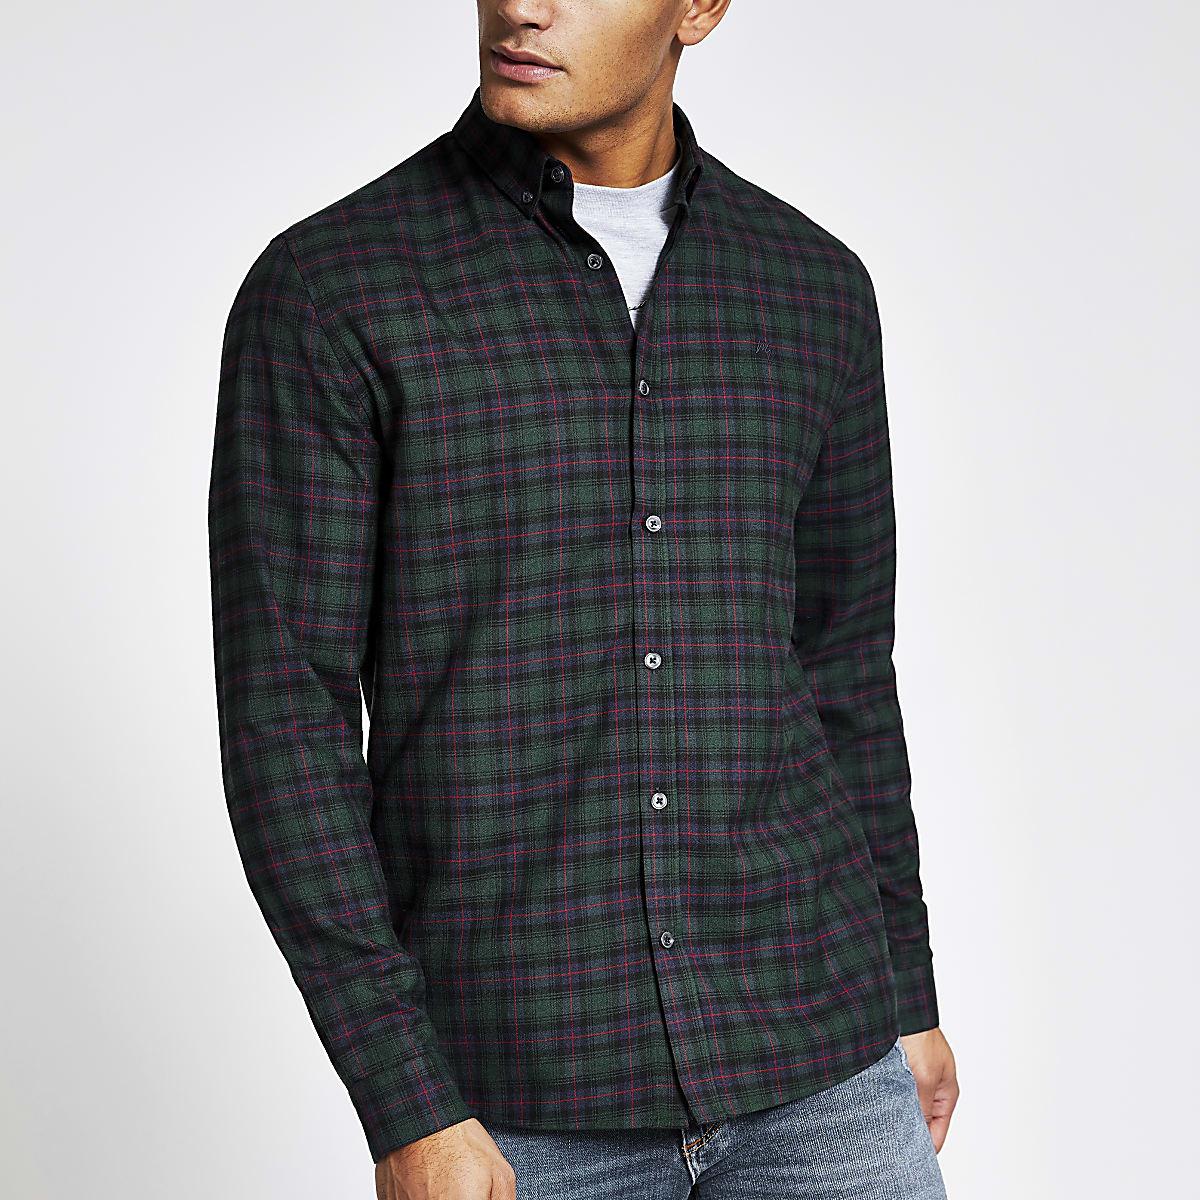 Maison Riviera green check slim fit shirt